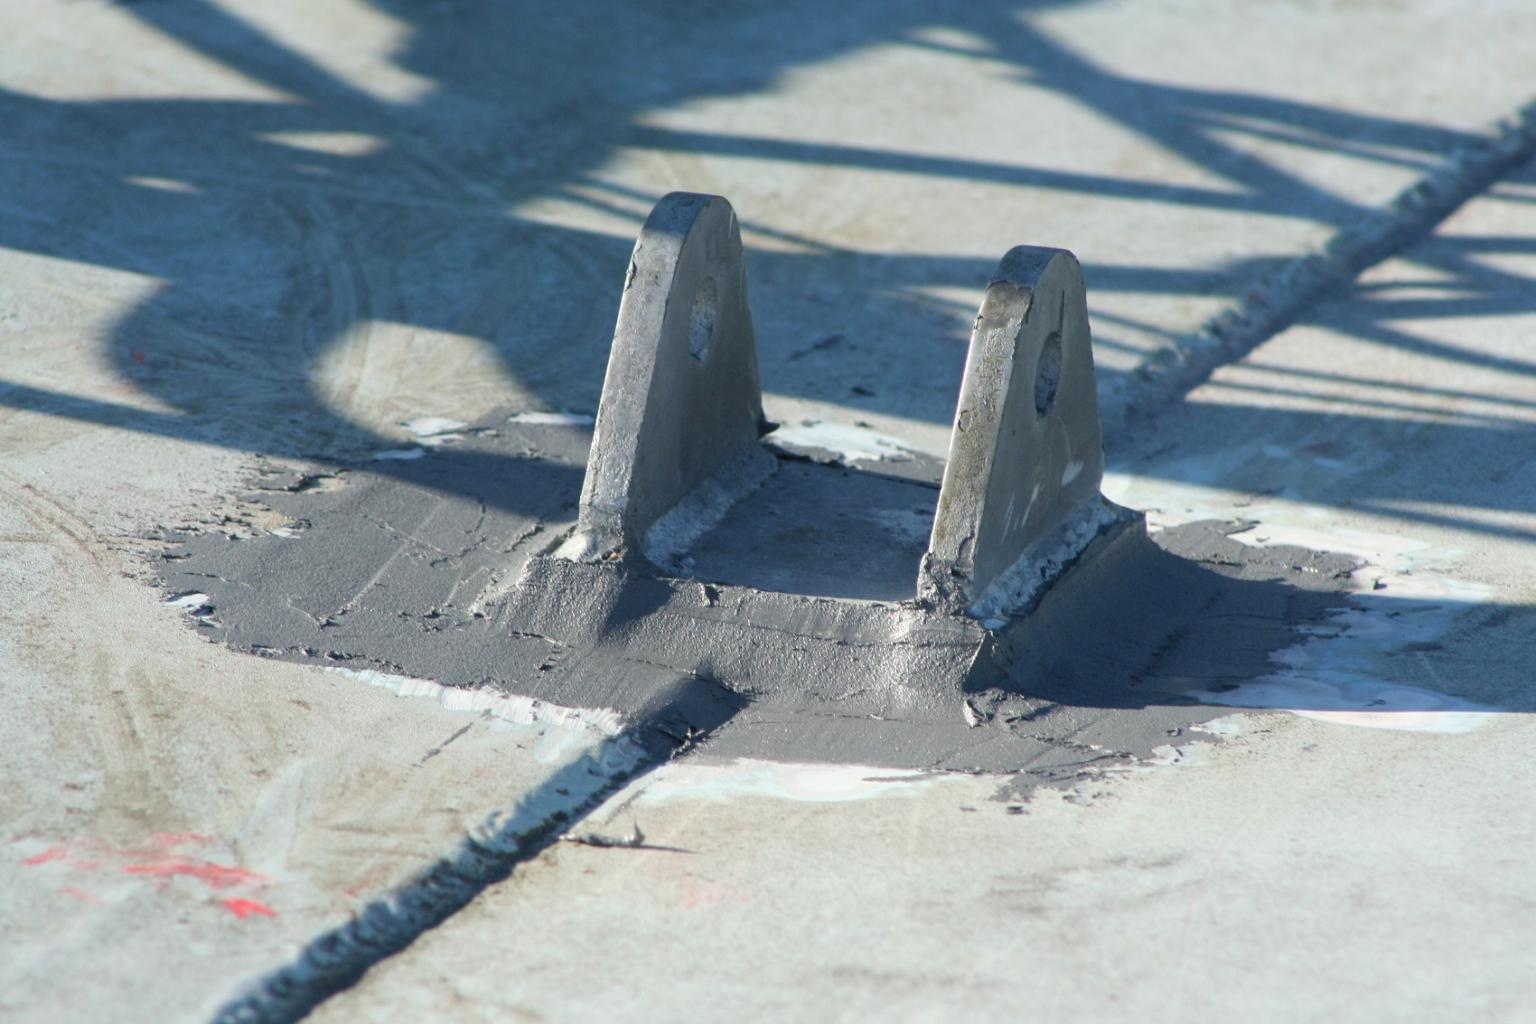 Mountingbrackets bonded in place using Belzona 1111